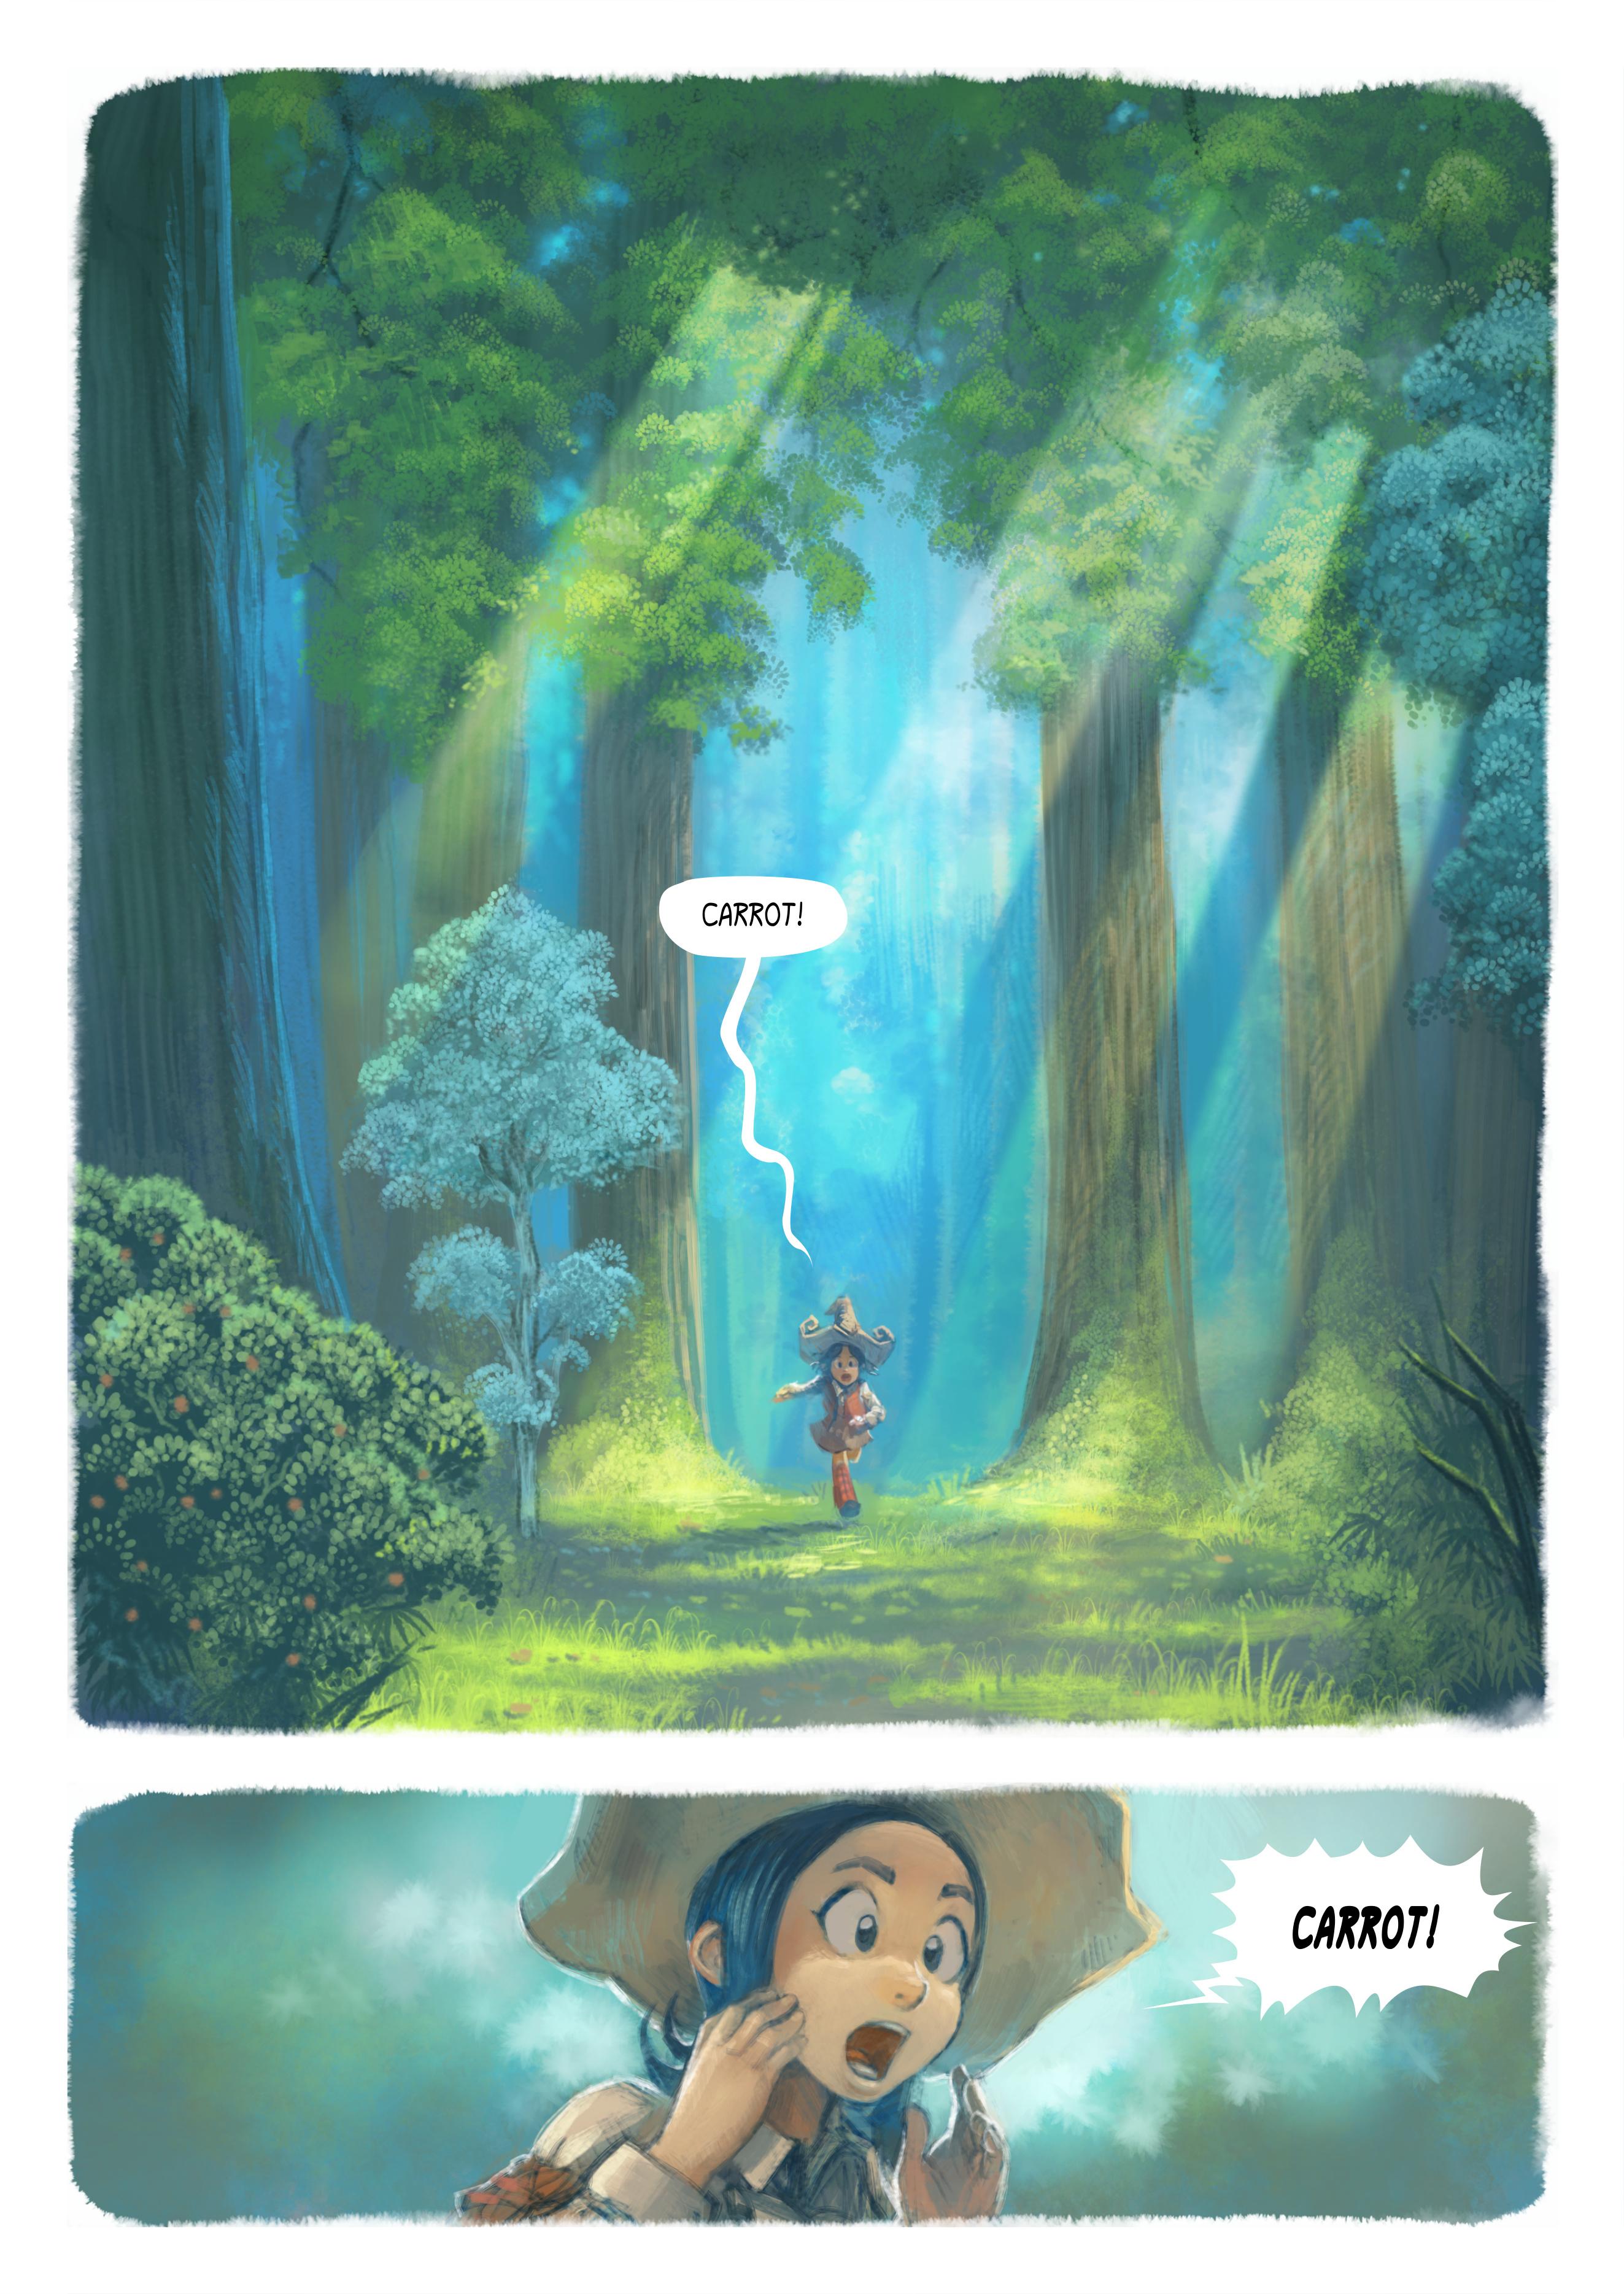 Episode 7: Ønsket, Page 1